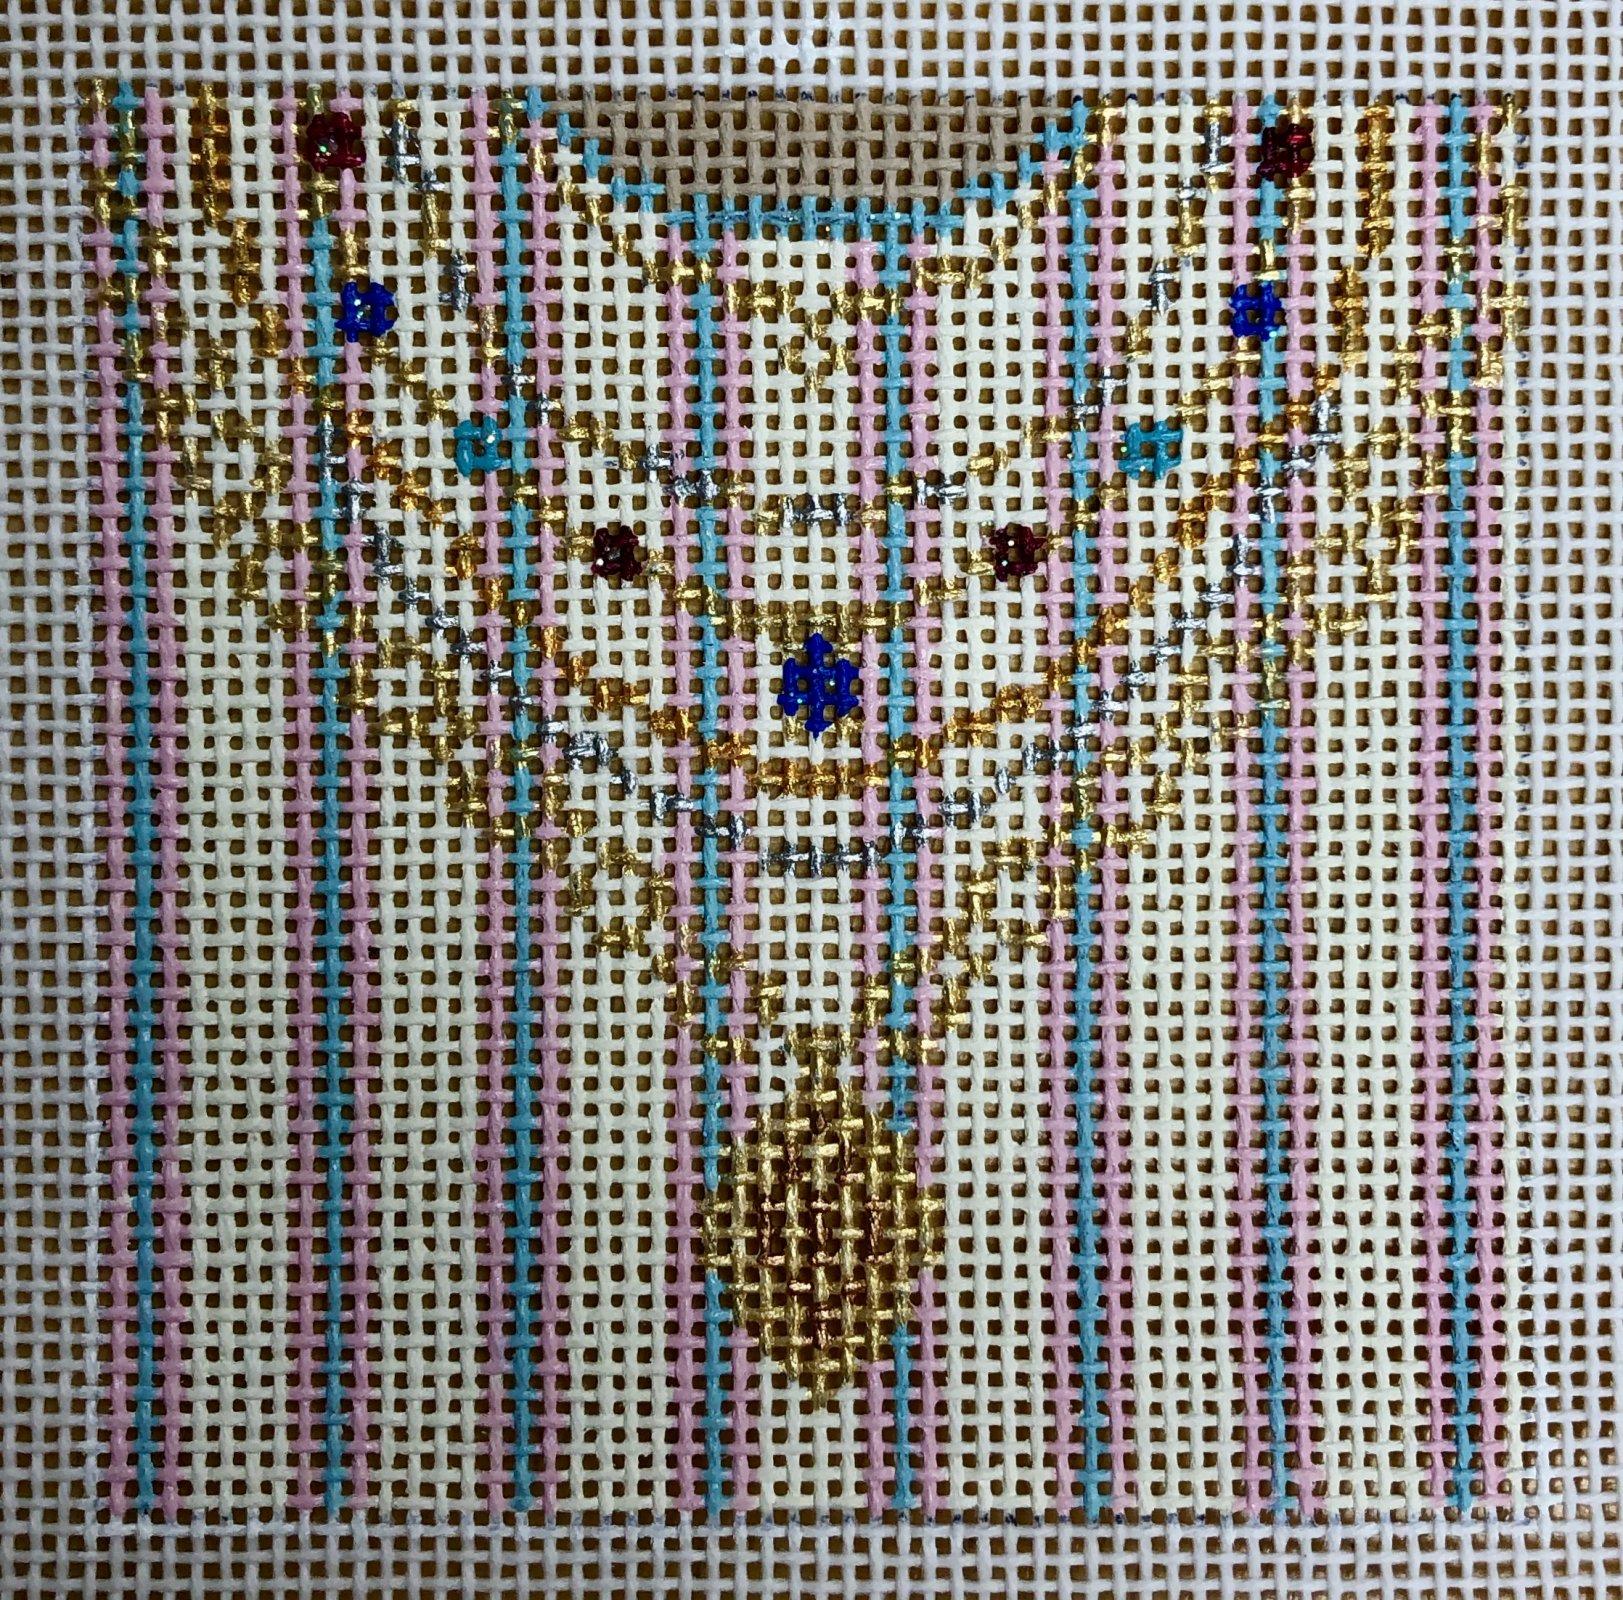 jewels & gems square